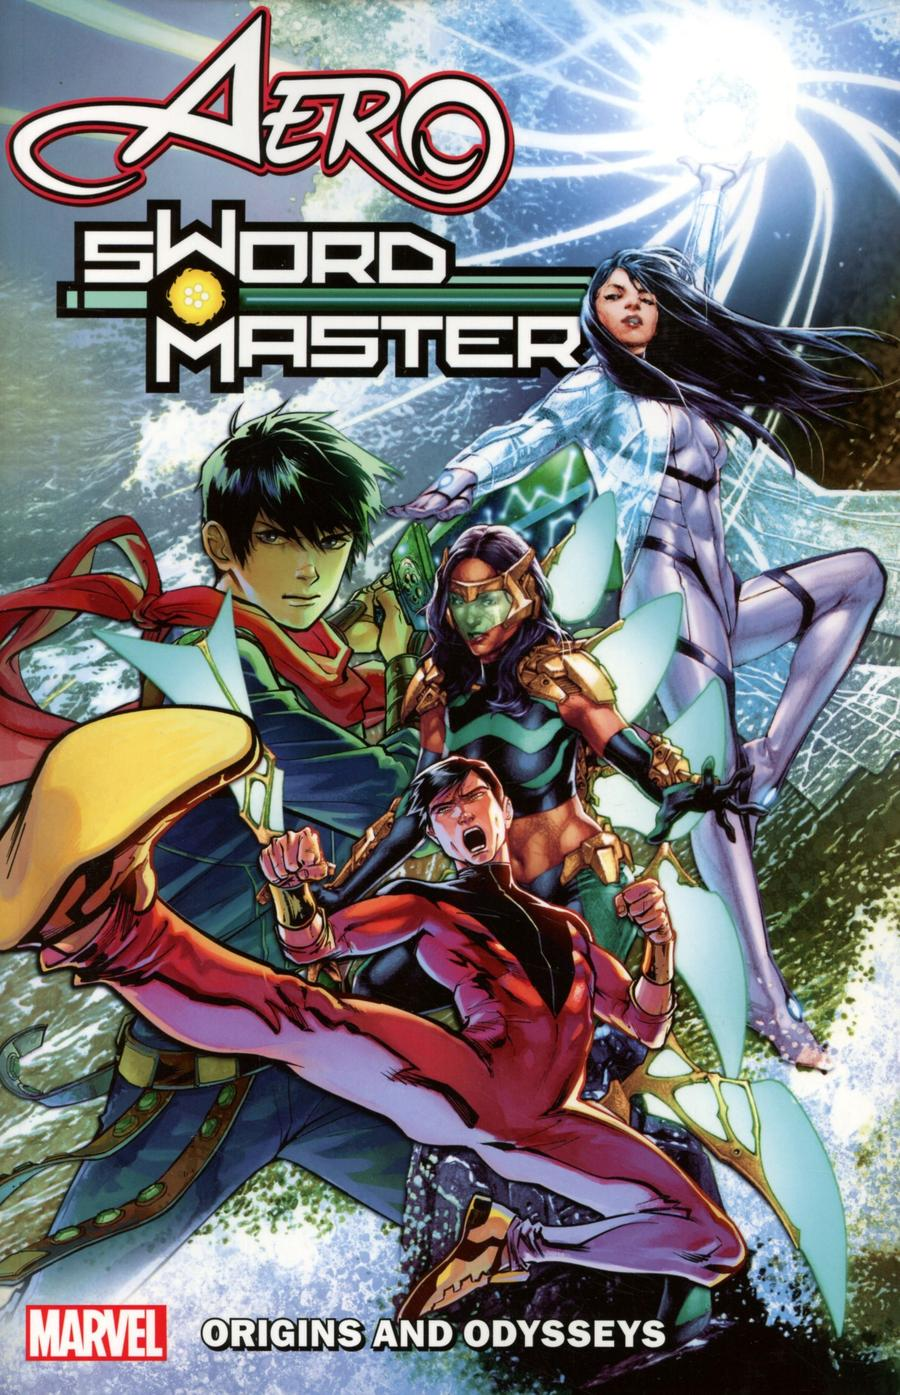 Aero & Sword Master Origins And Odysseys TP